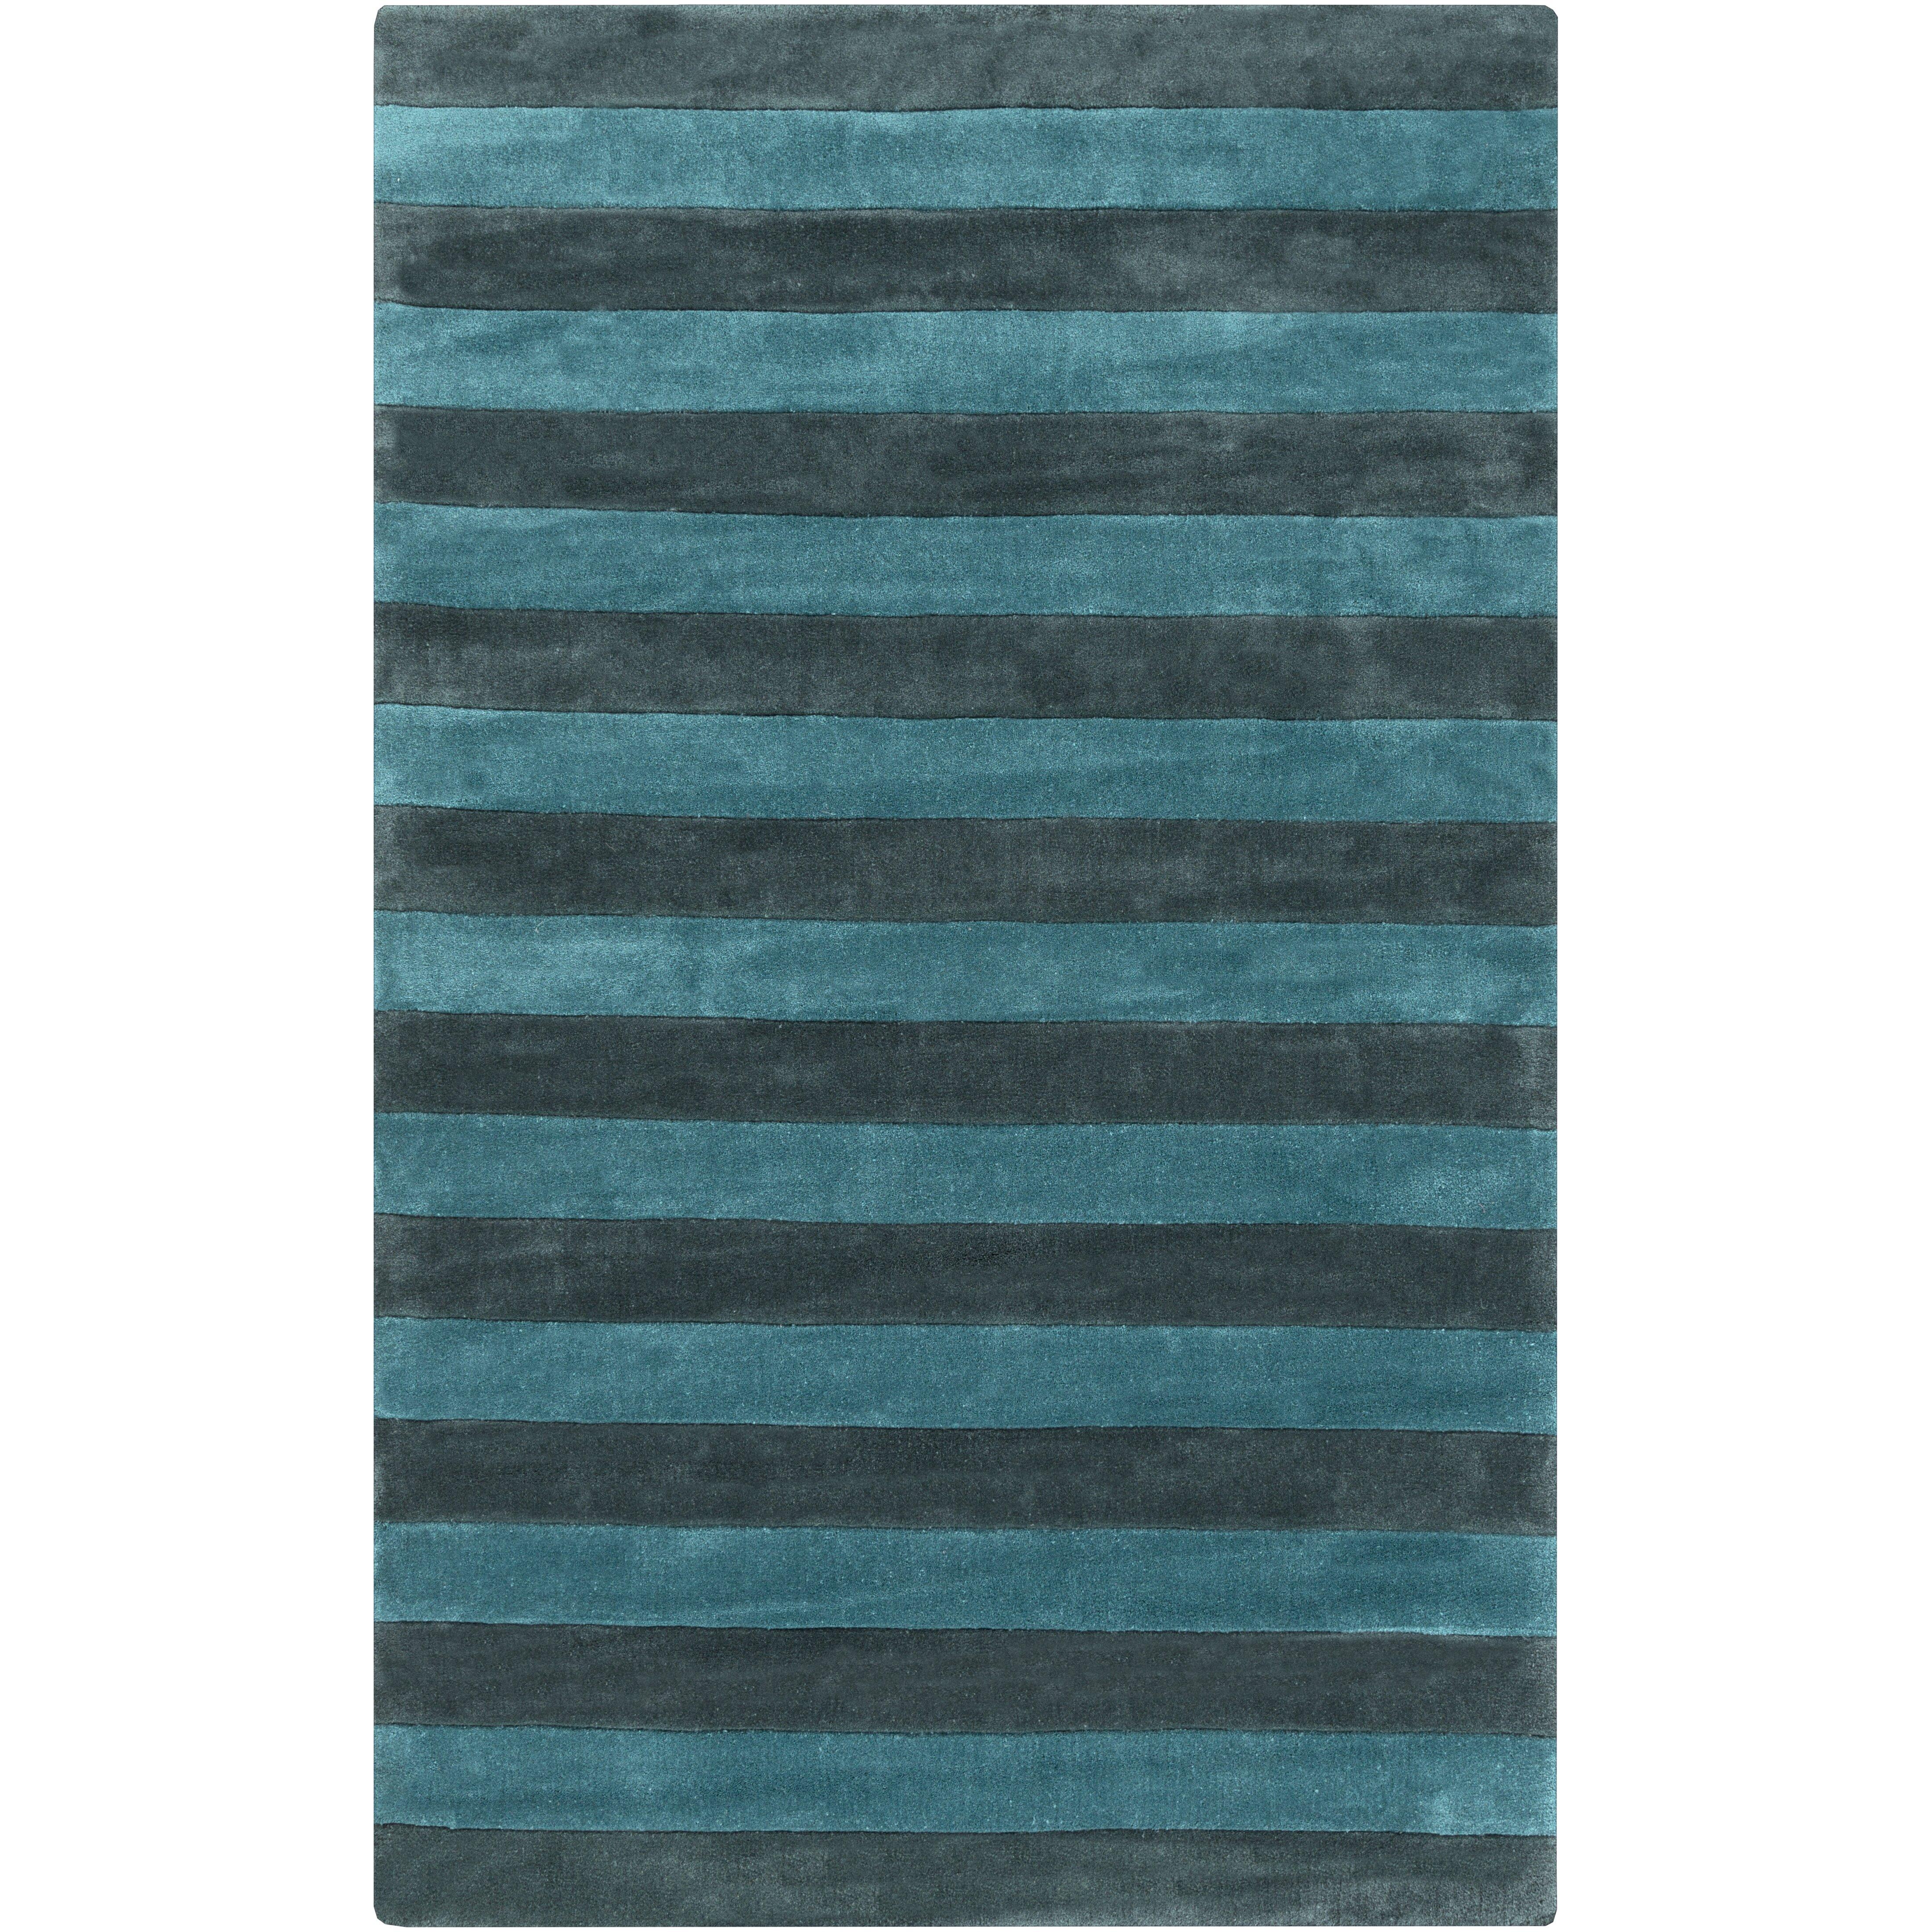 Surya Cosmopolitan Teal/Gray Stripe Area Rug & Reviews